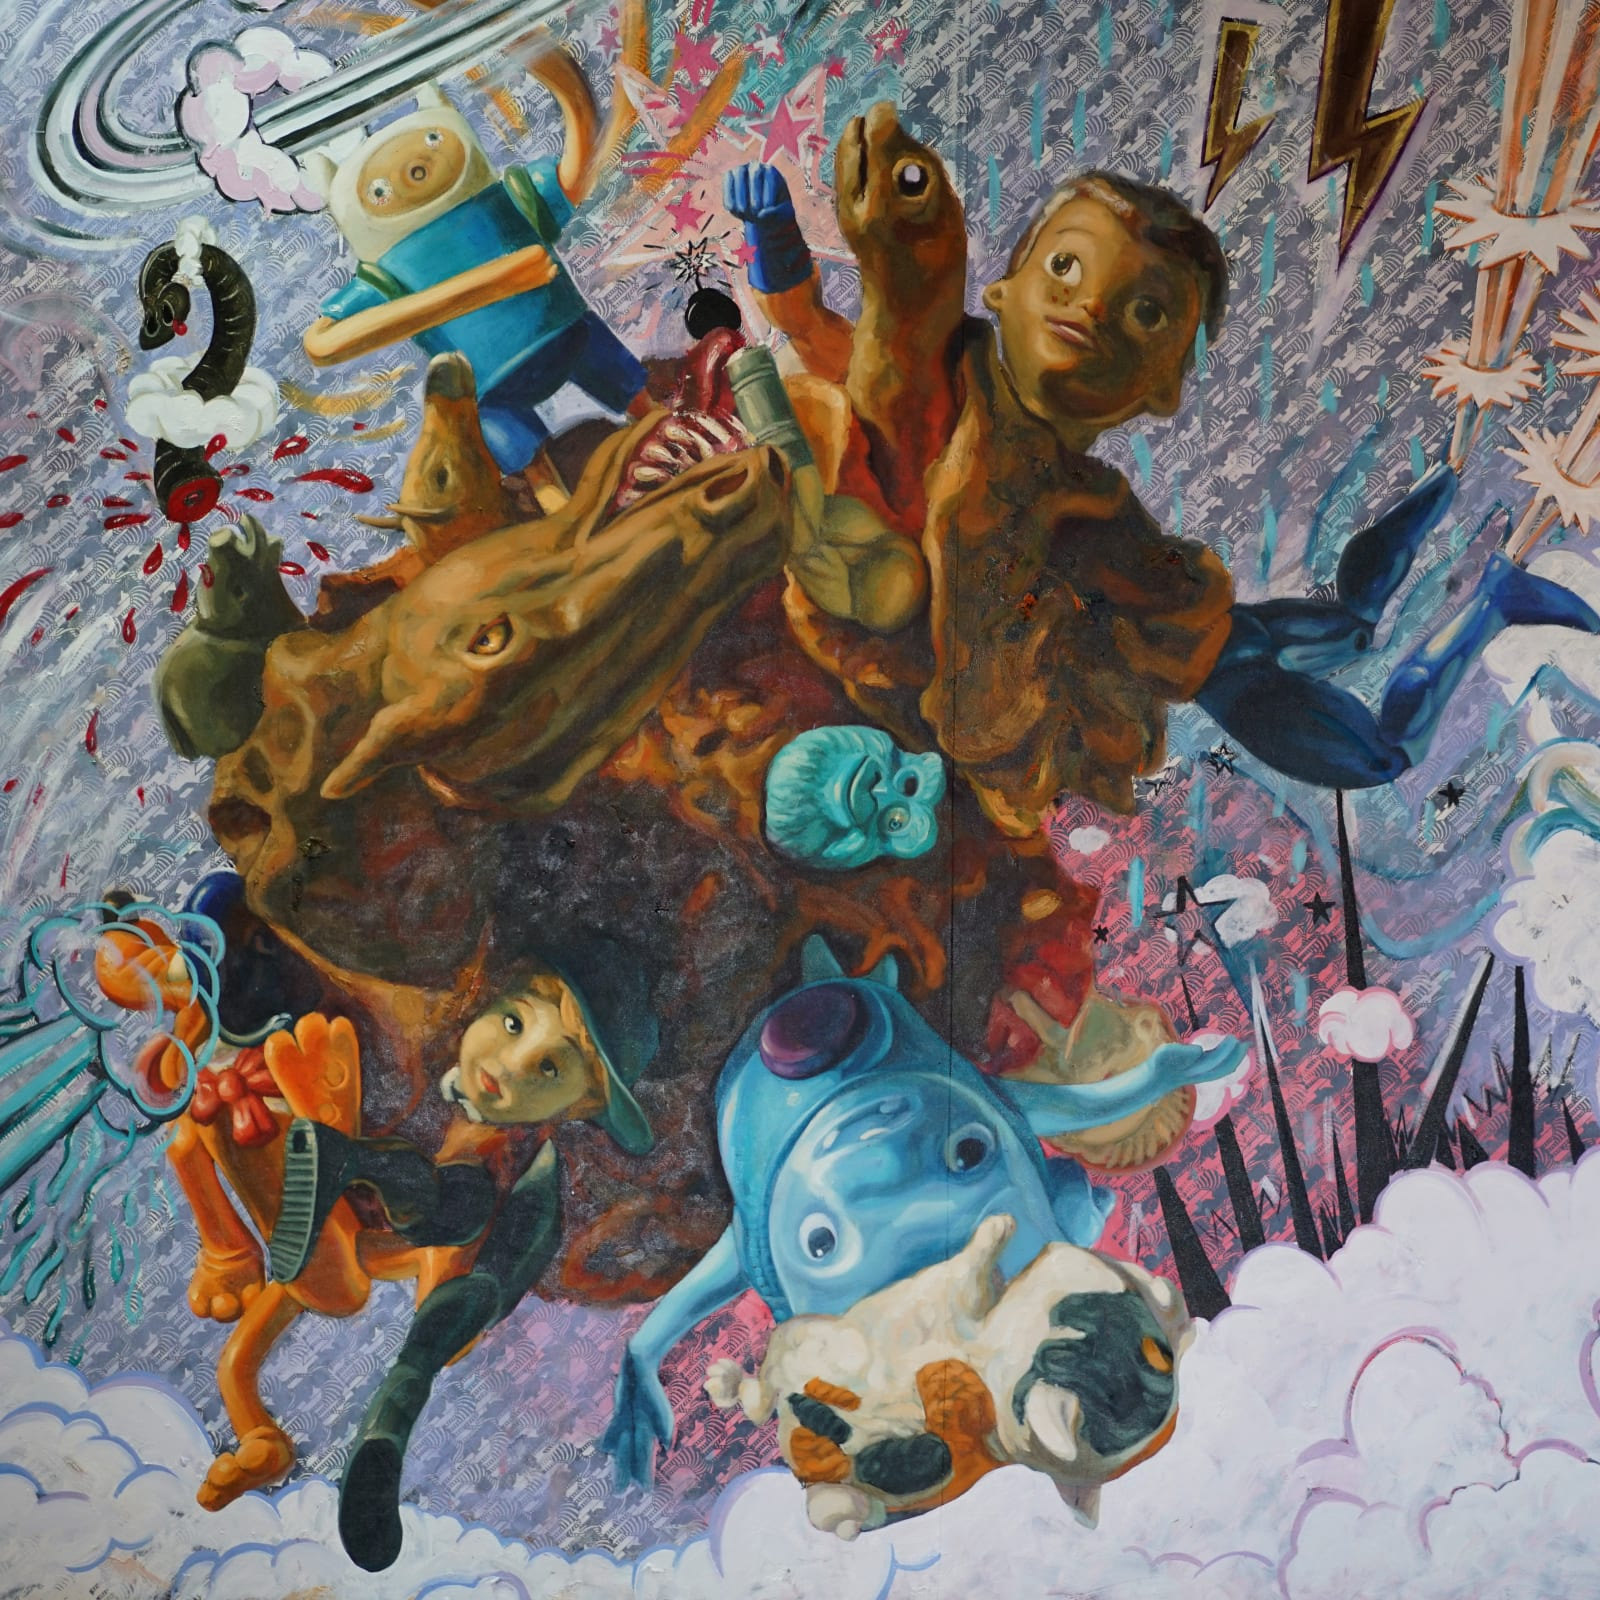 Miguel Alejandro Machado Suarez  Beyond Toy Stories 4, 2017  acrylic and oil on canvas  200 x 200 cm